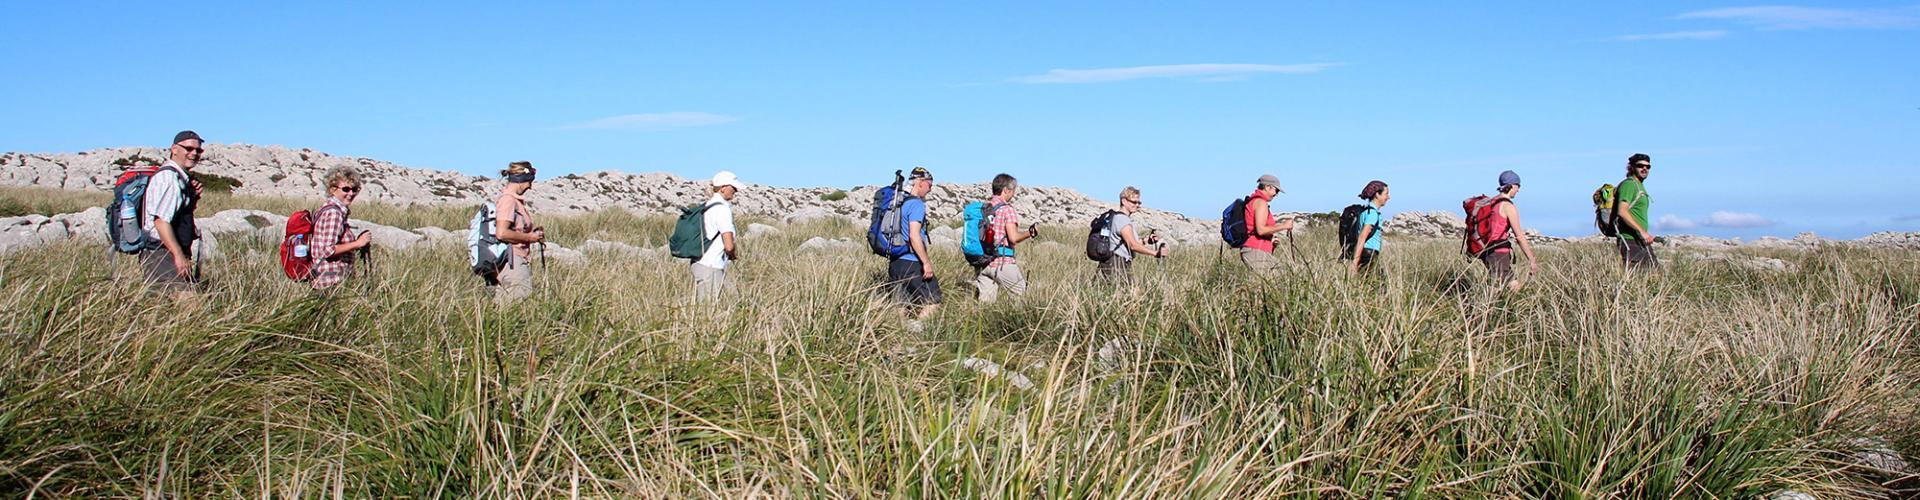 ASI Wanderreisen auf Mallorca